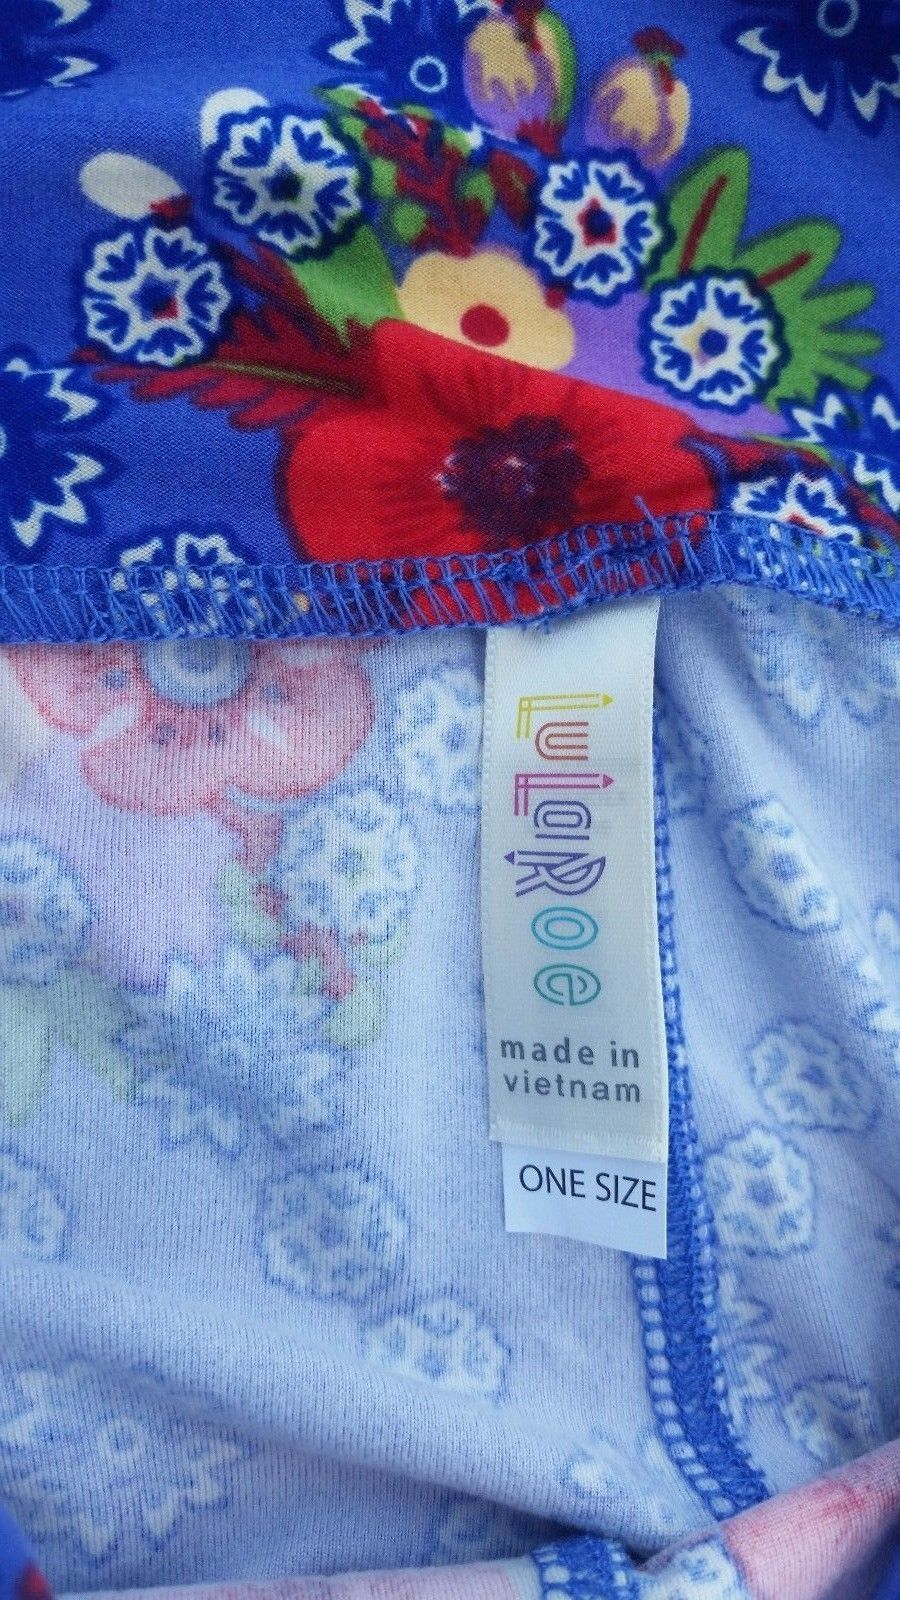 Lularoe OS One size Purpley Blue Floral Leggings Brand New So Cute! image 3